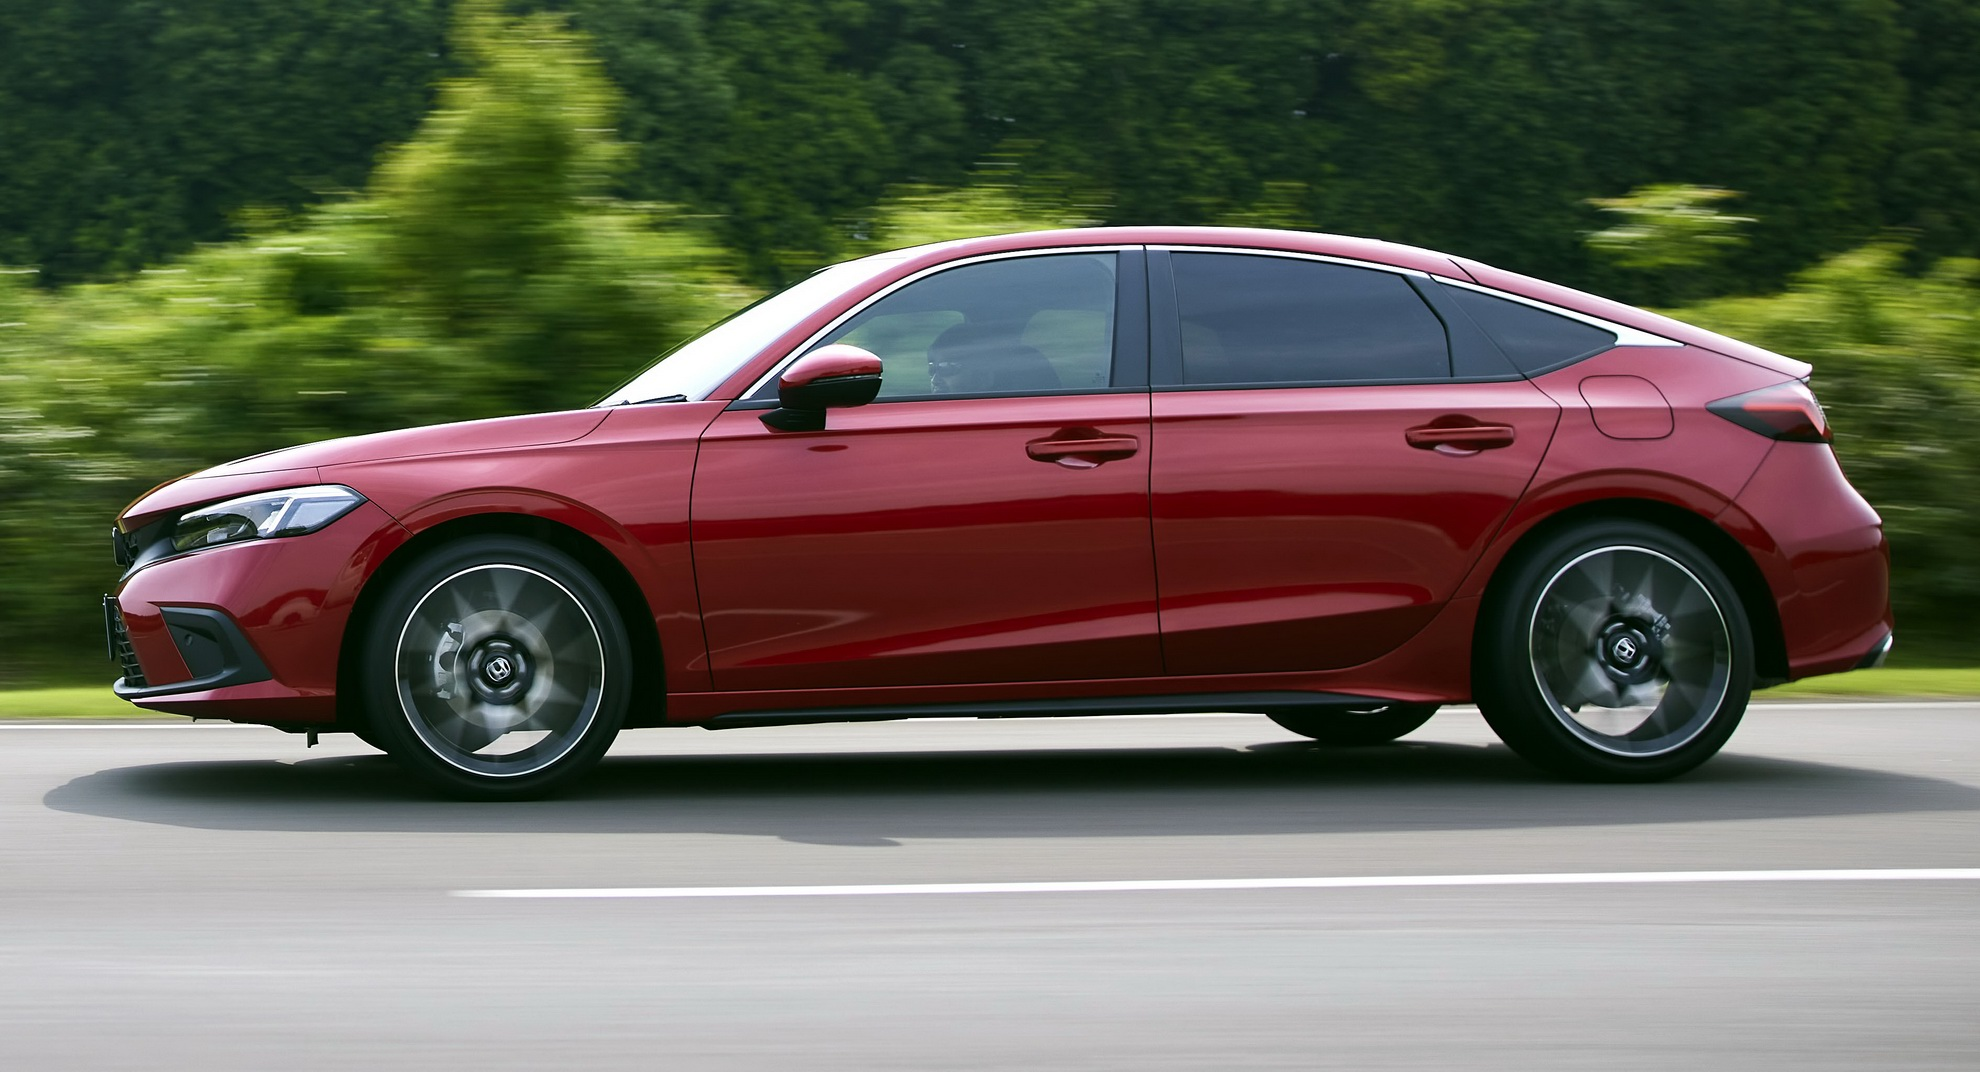 Honda отворена за партнерство: целта е електрични возила достапни за сите